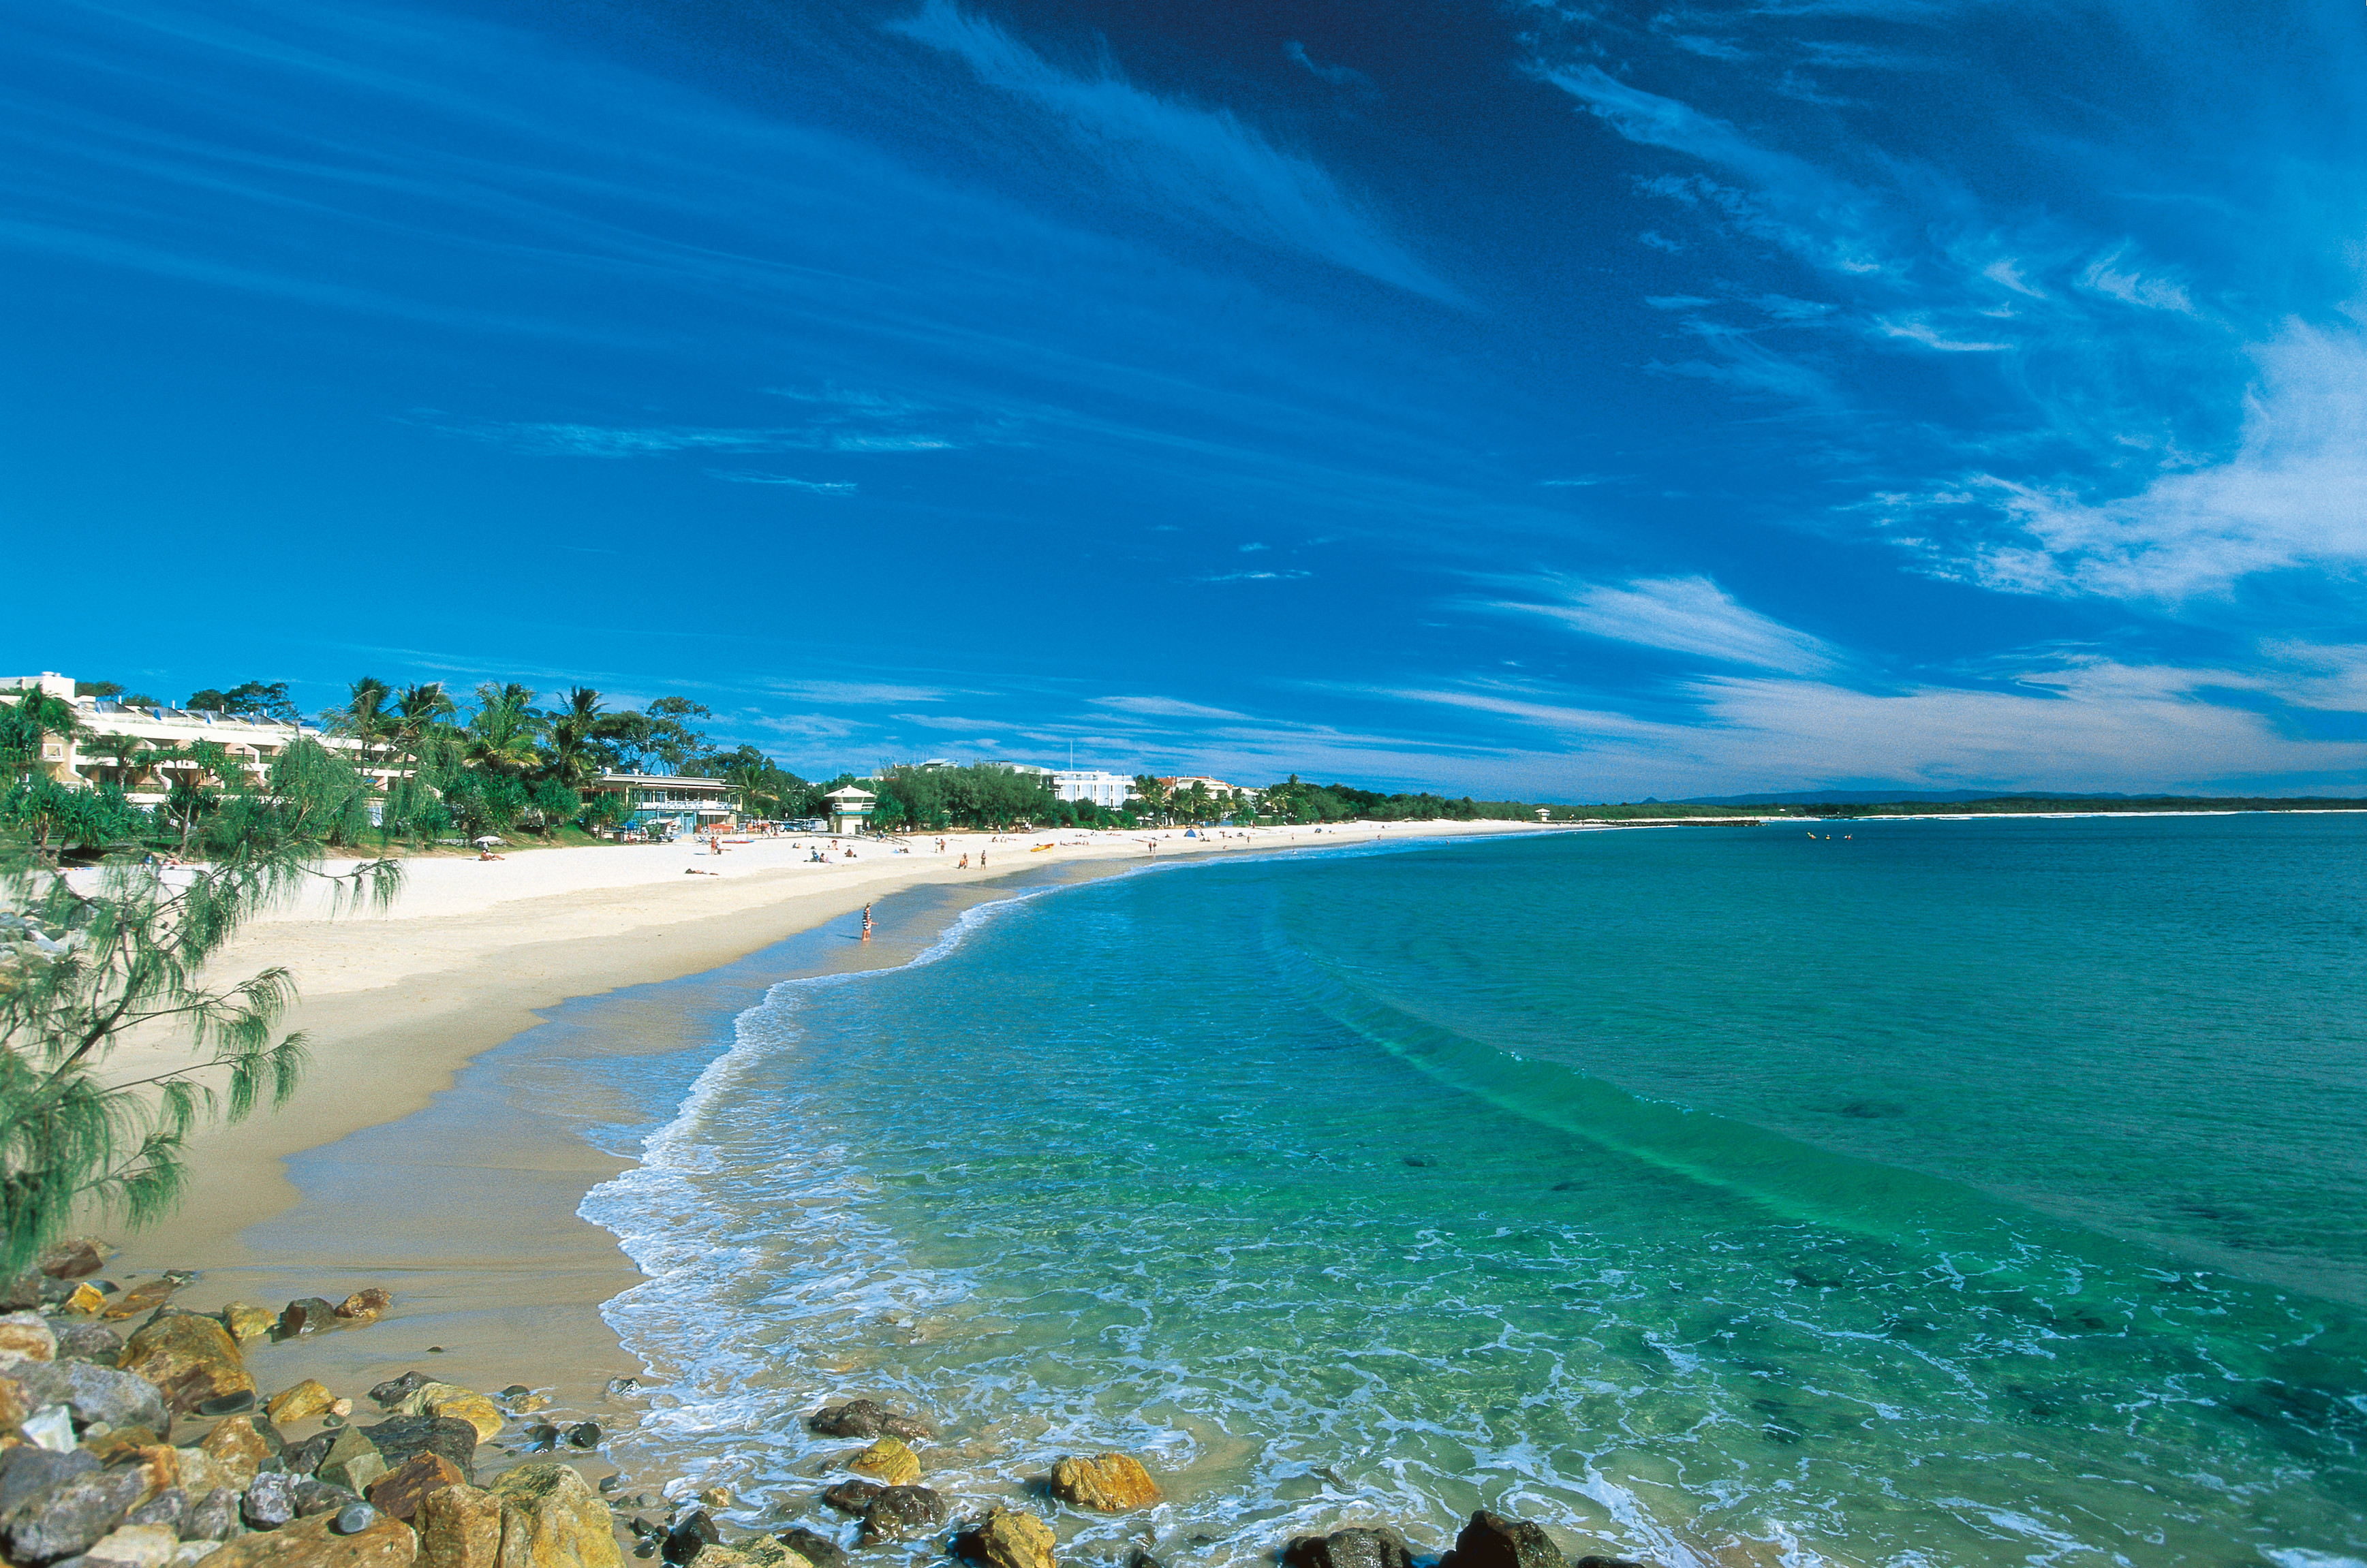 https://assets.boxdice.com.au/laguna/attachments/c78/702/tourism_noosa_noosa_main_beach.jpg?35154aa541b2532b47b933eed610a7f6